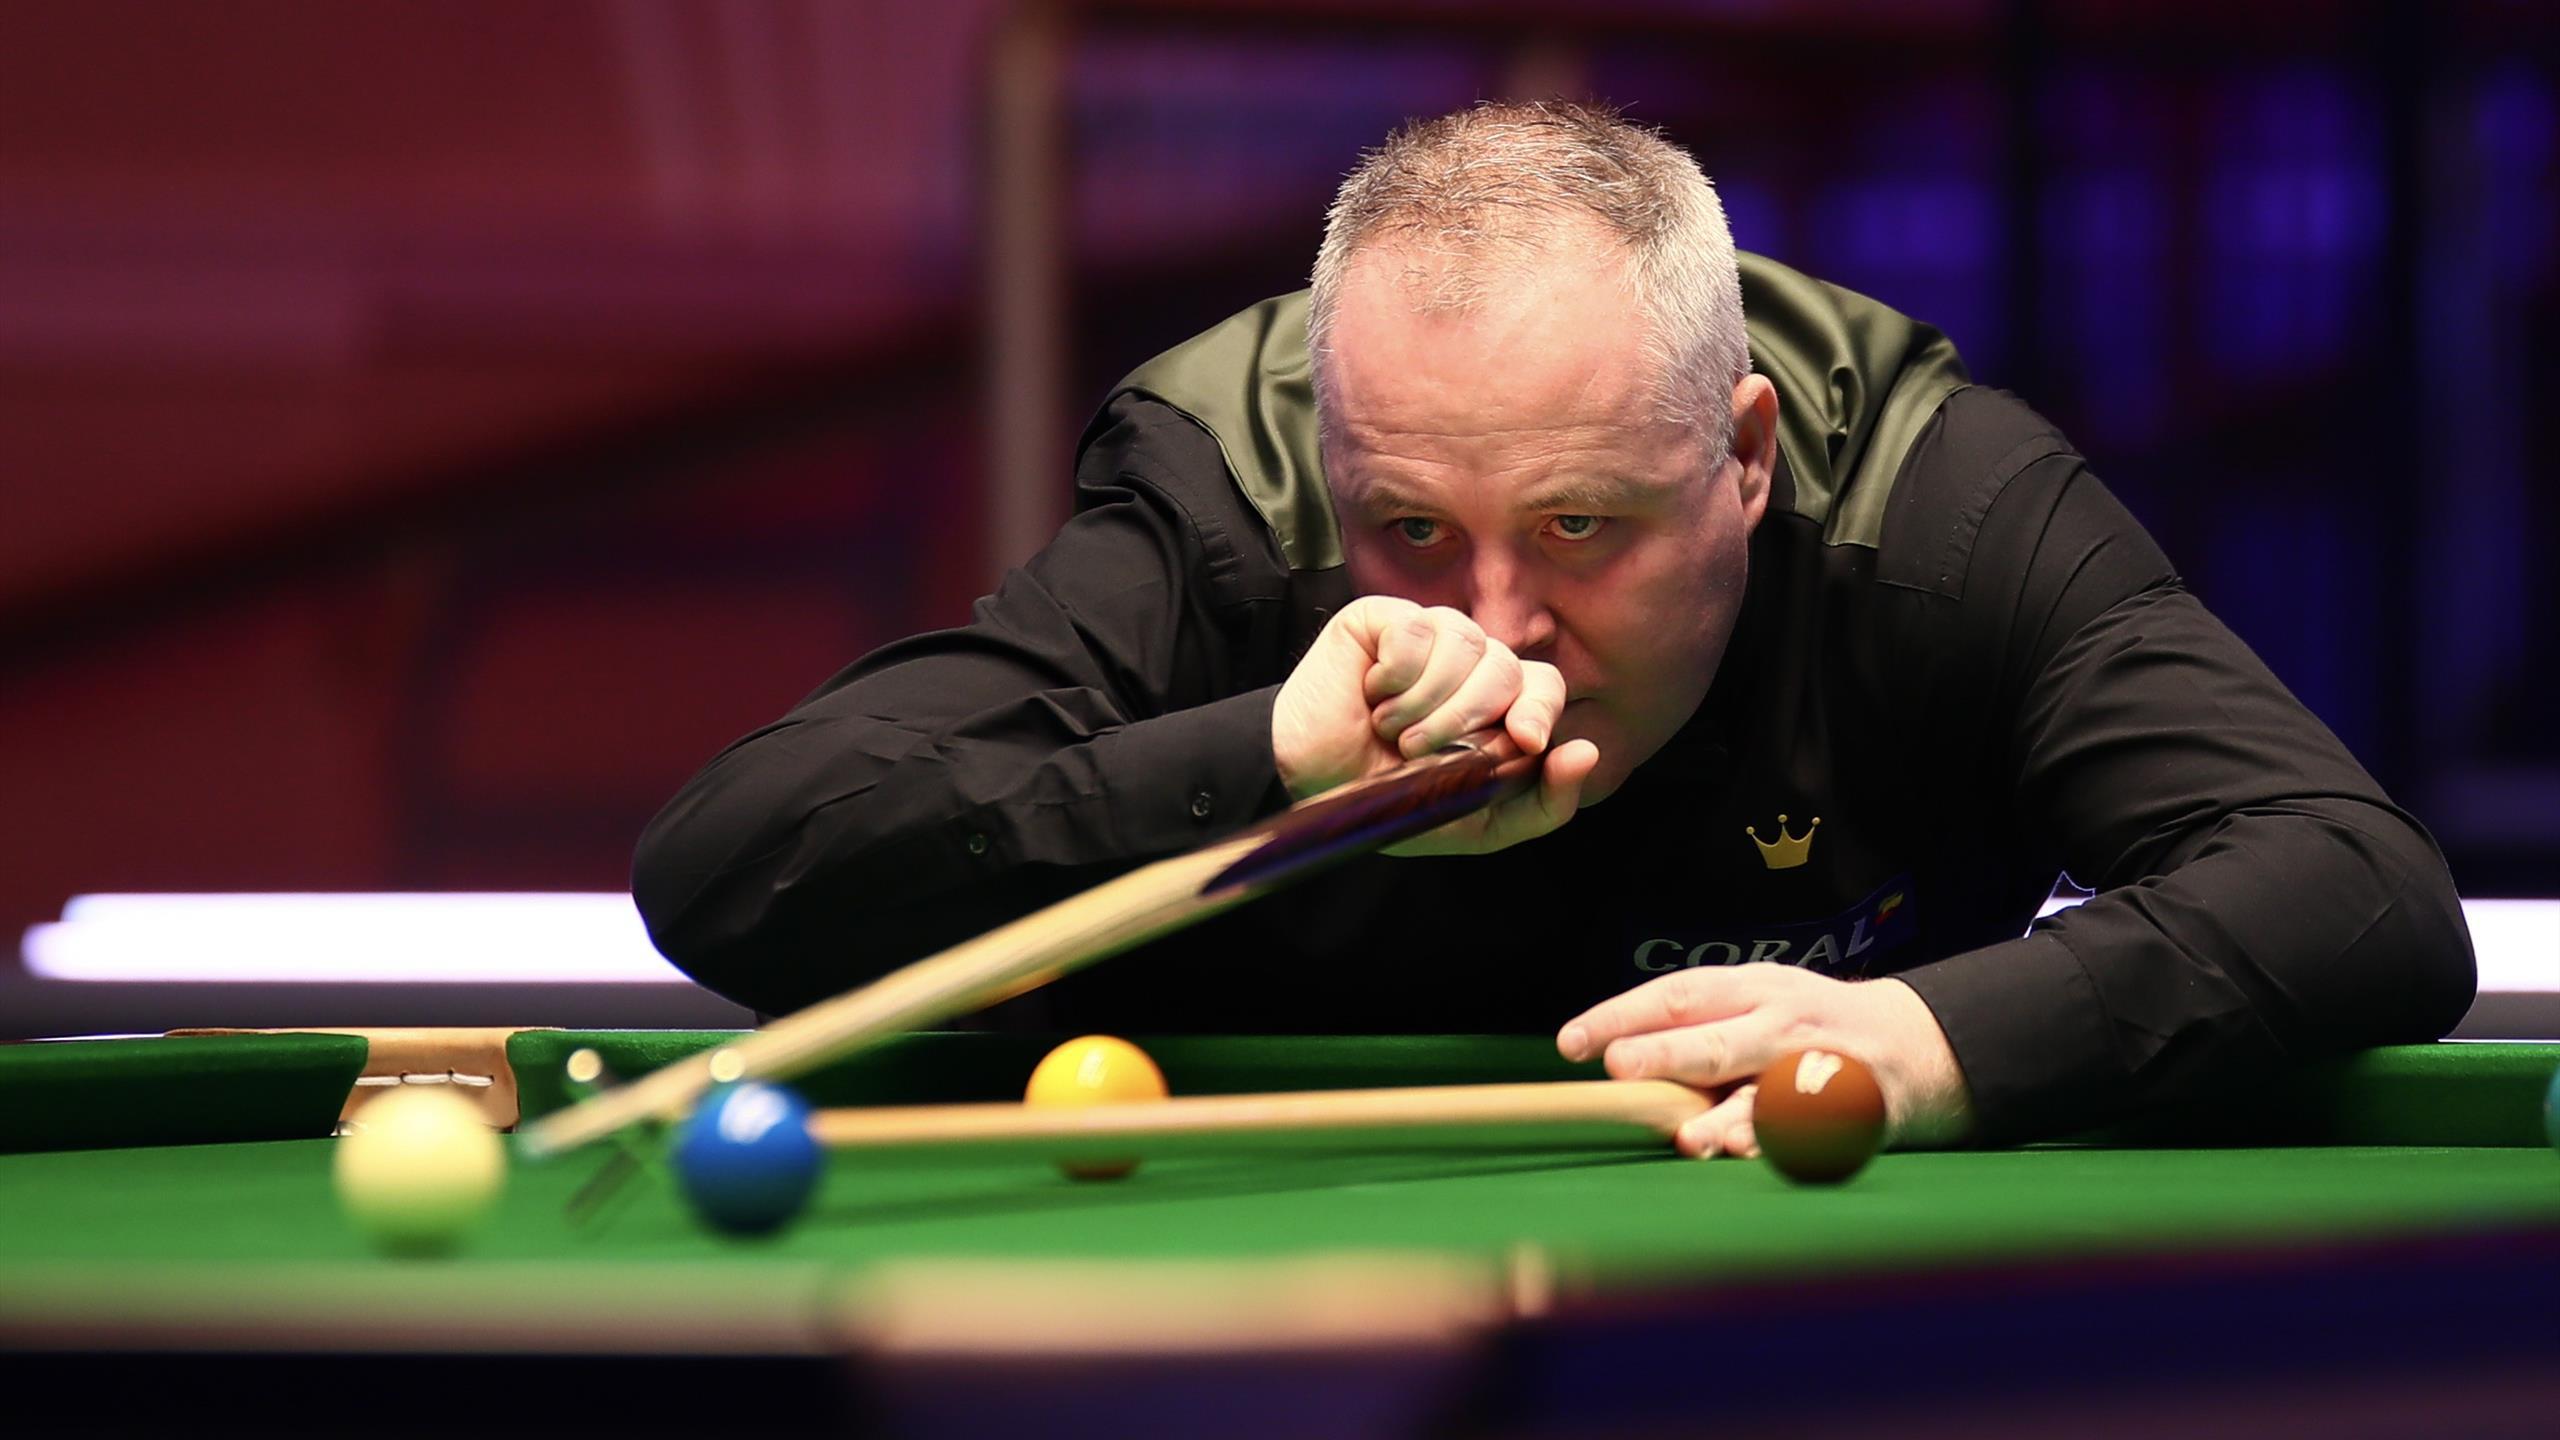 Masters Snooker 2021 Live John Higgins Takes On Mark Allen After Ronnie O Sullivan Beats Ding Eurosport